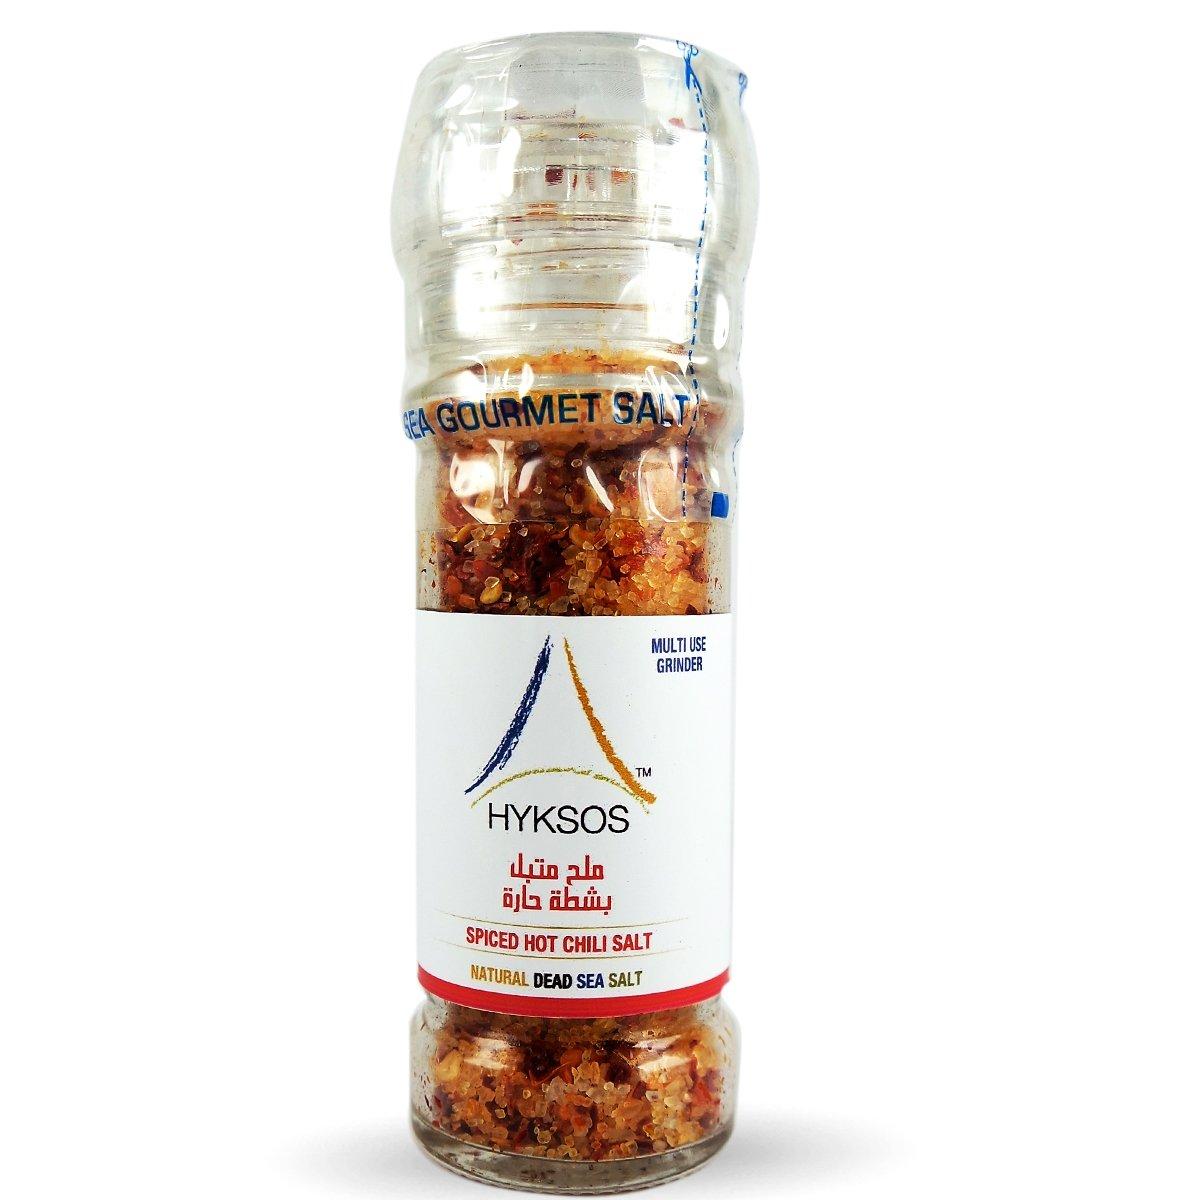 Hyksos Natural Spiced Hot Chilli Salt 3.9 oz - Multi Use Grinder